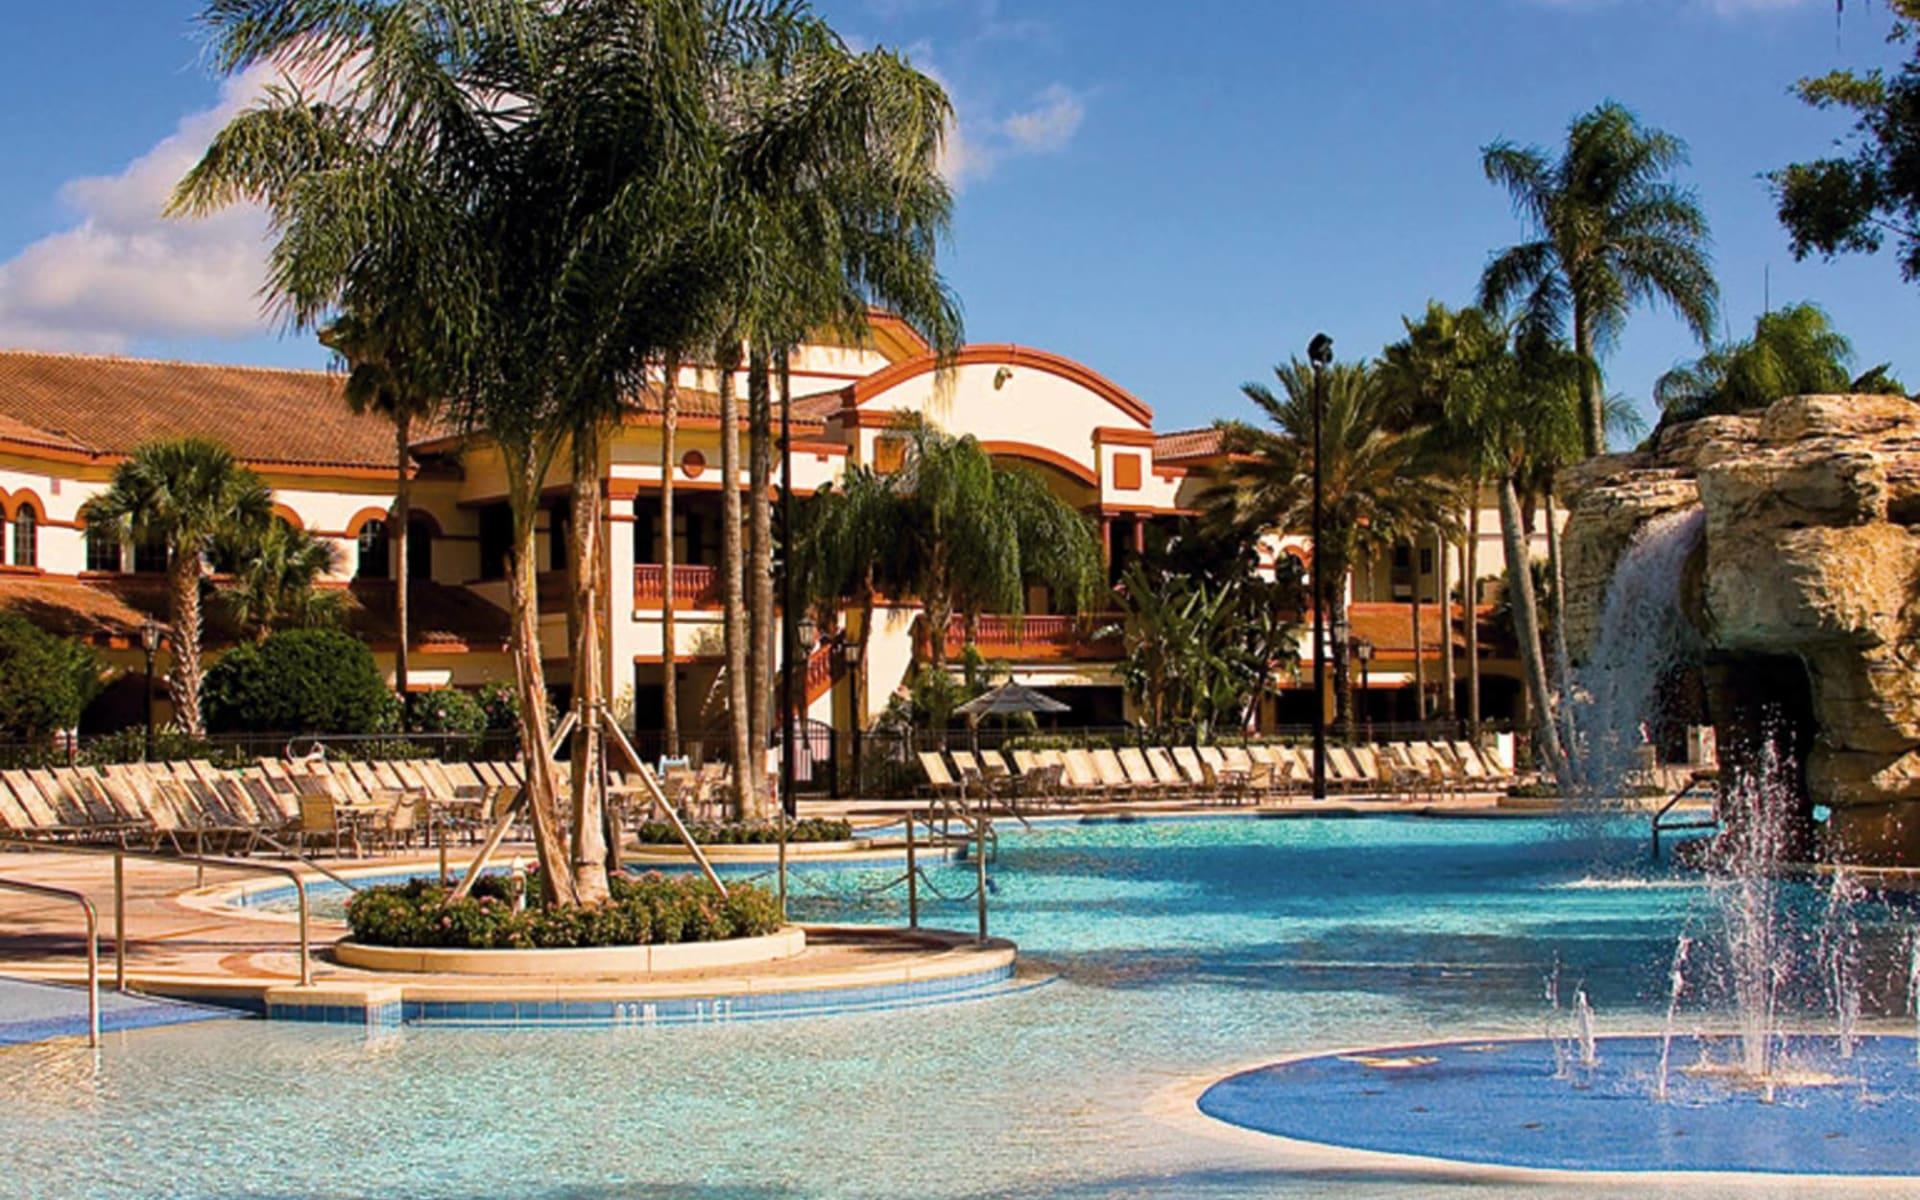 Sheraton Vistana Villages in Orlando: pool sheraton vistana villages gartenanlage